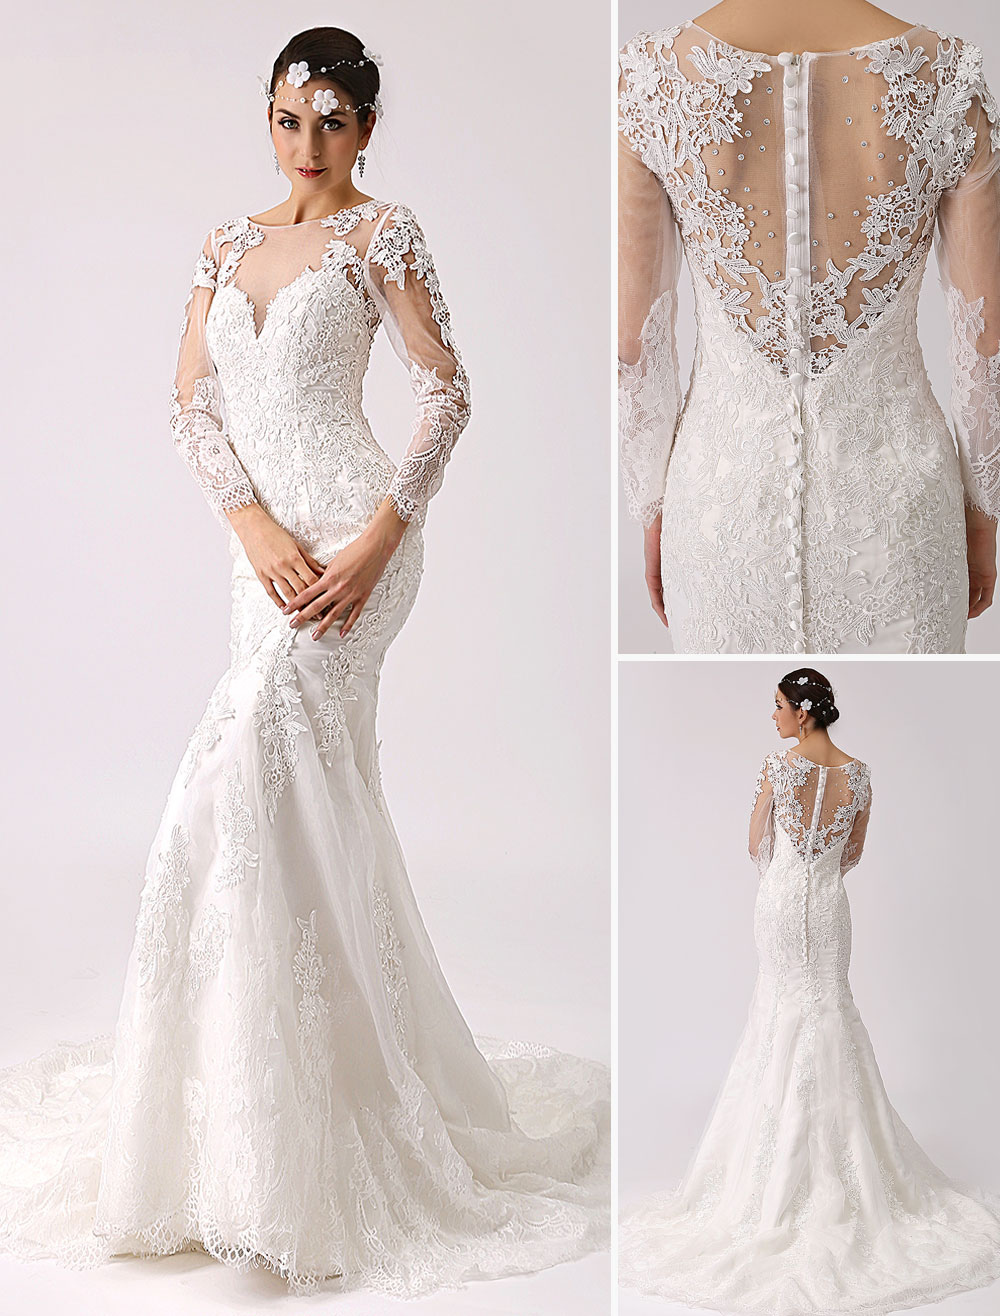 Long Sleeve Illusion Neck Mermaid Wedding Dress Milanoo